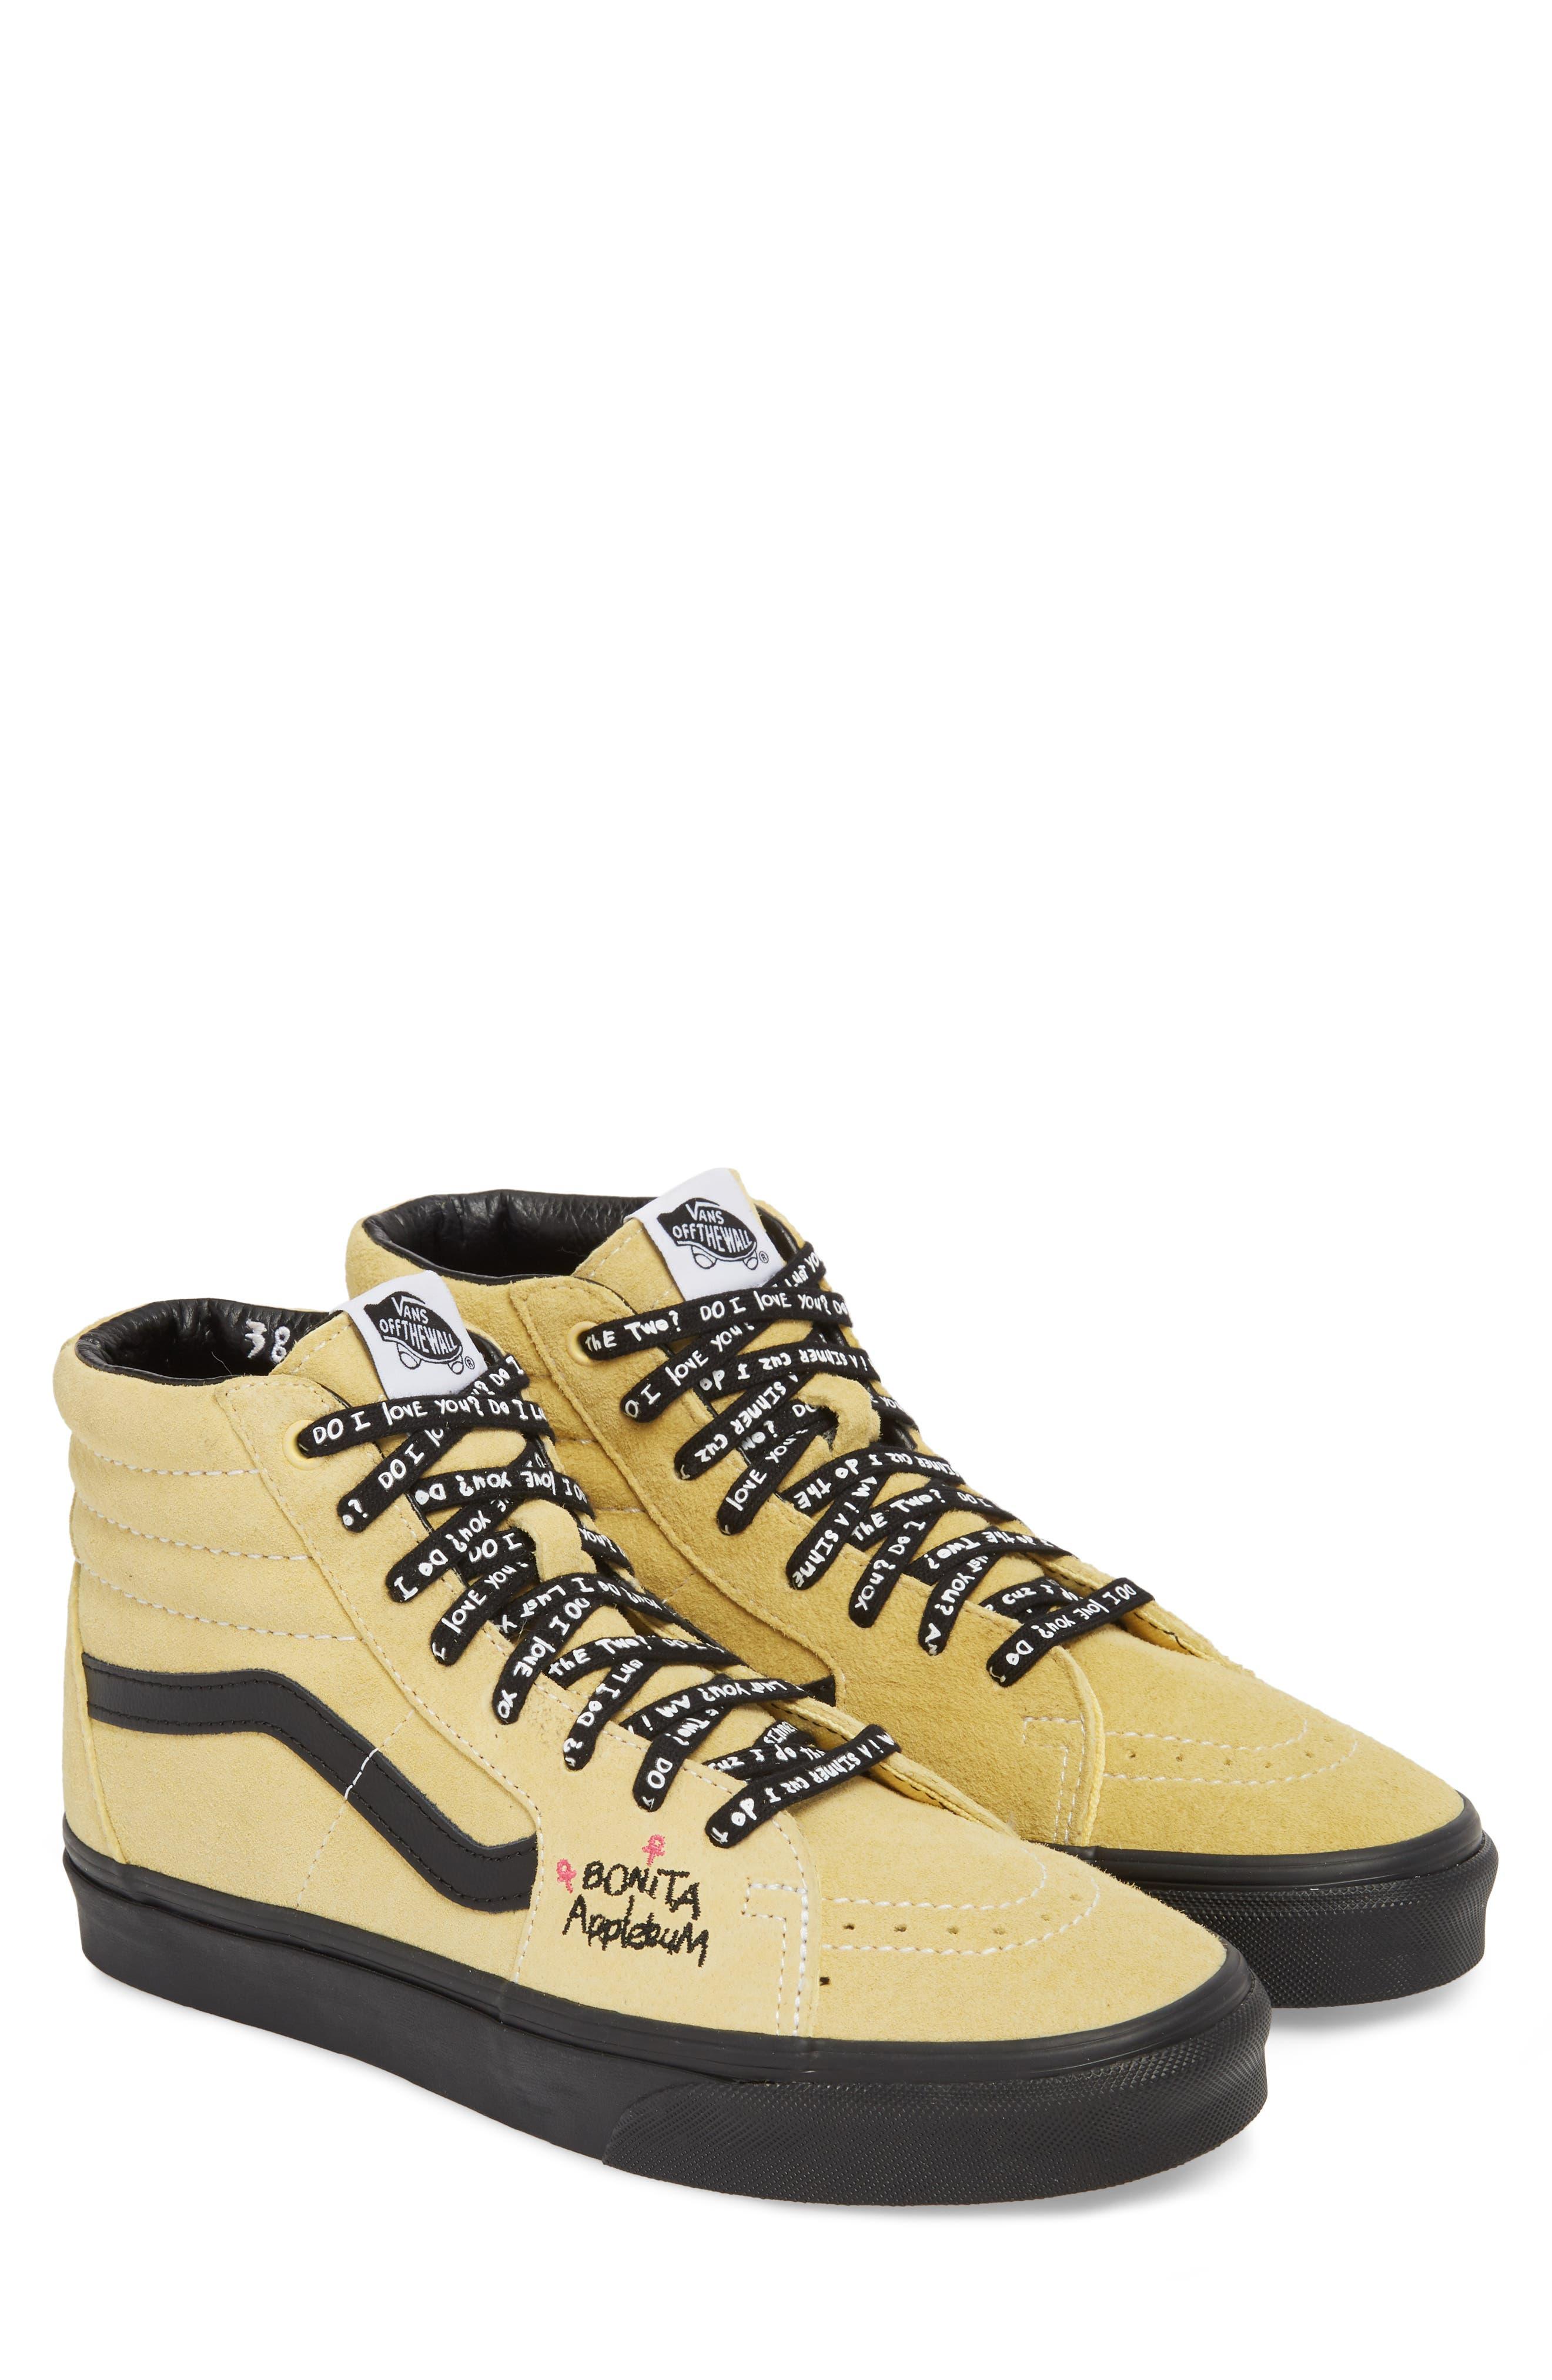 ATCQ Sk8-Hi Sneaker,                             Alternate thumbnail 2, color,                             720